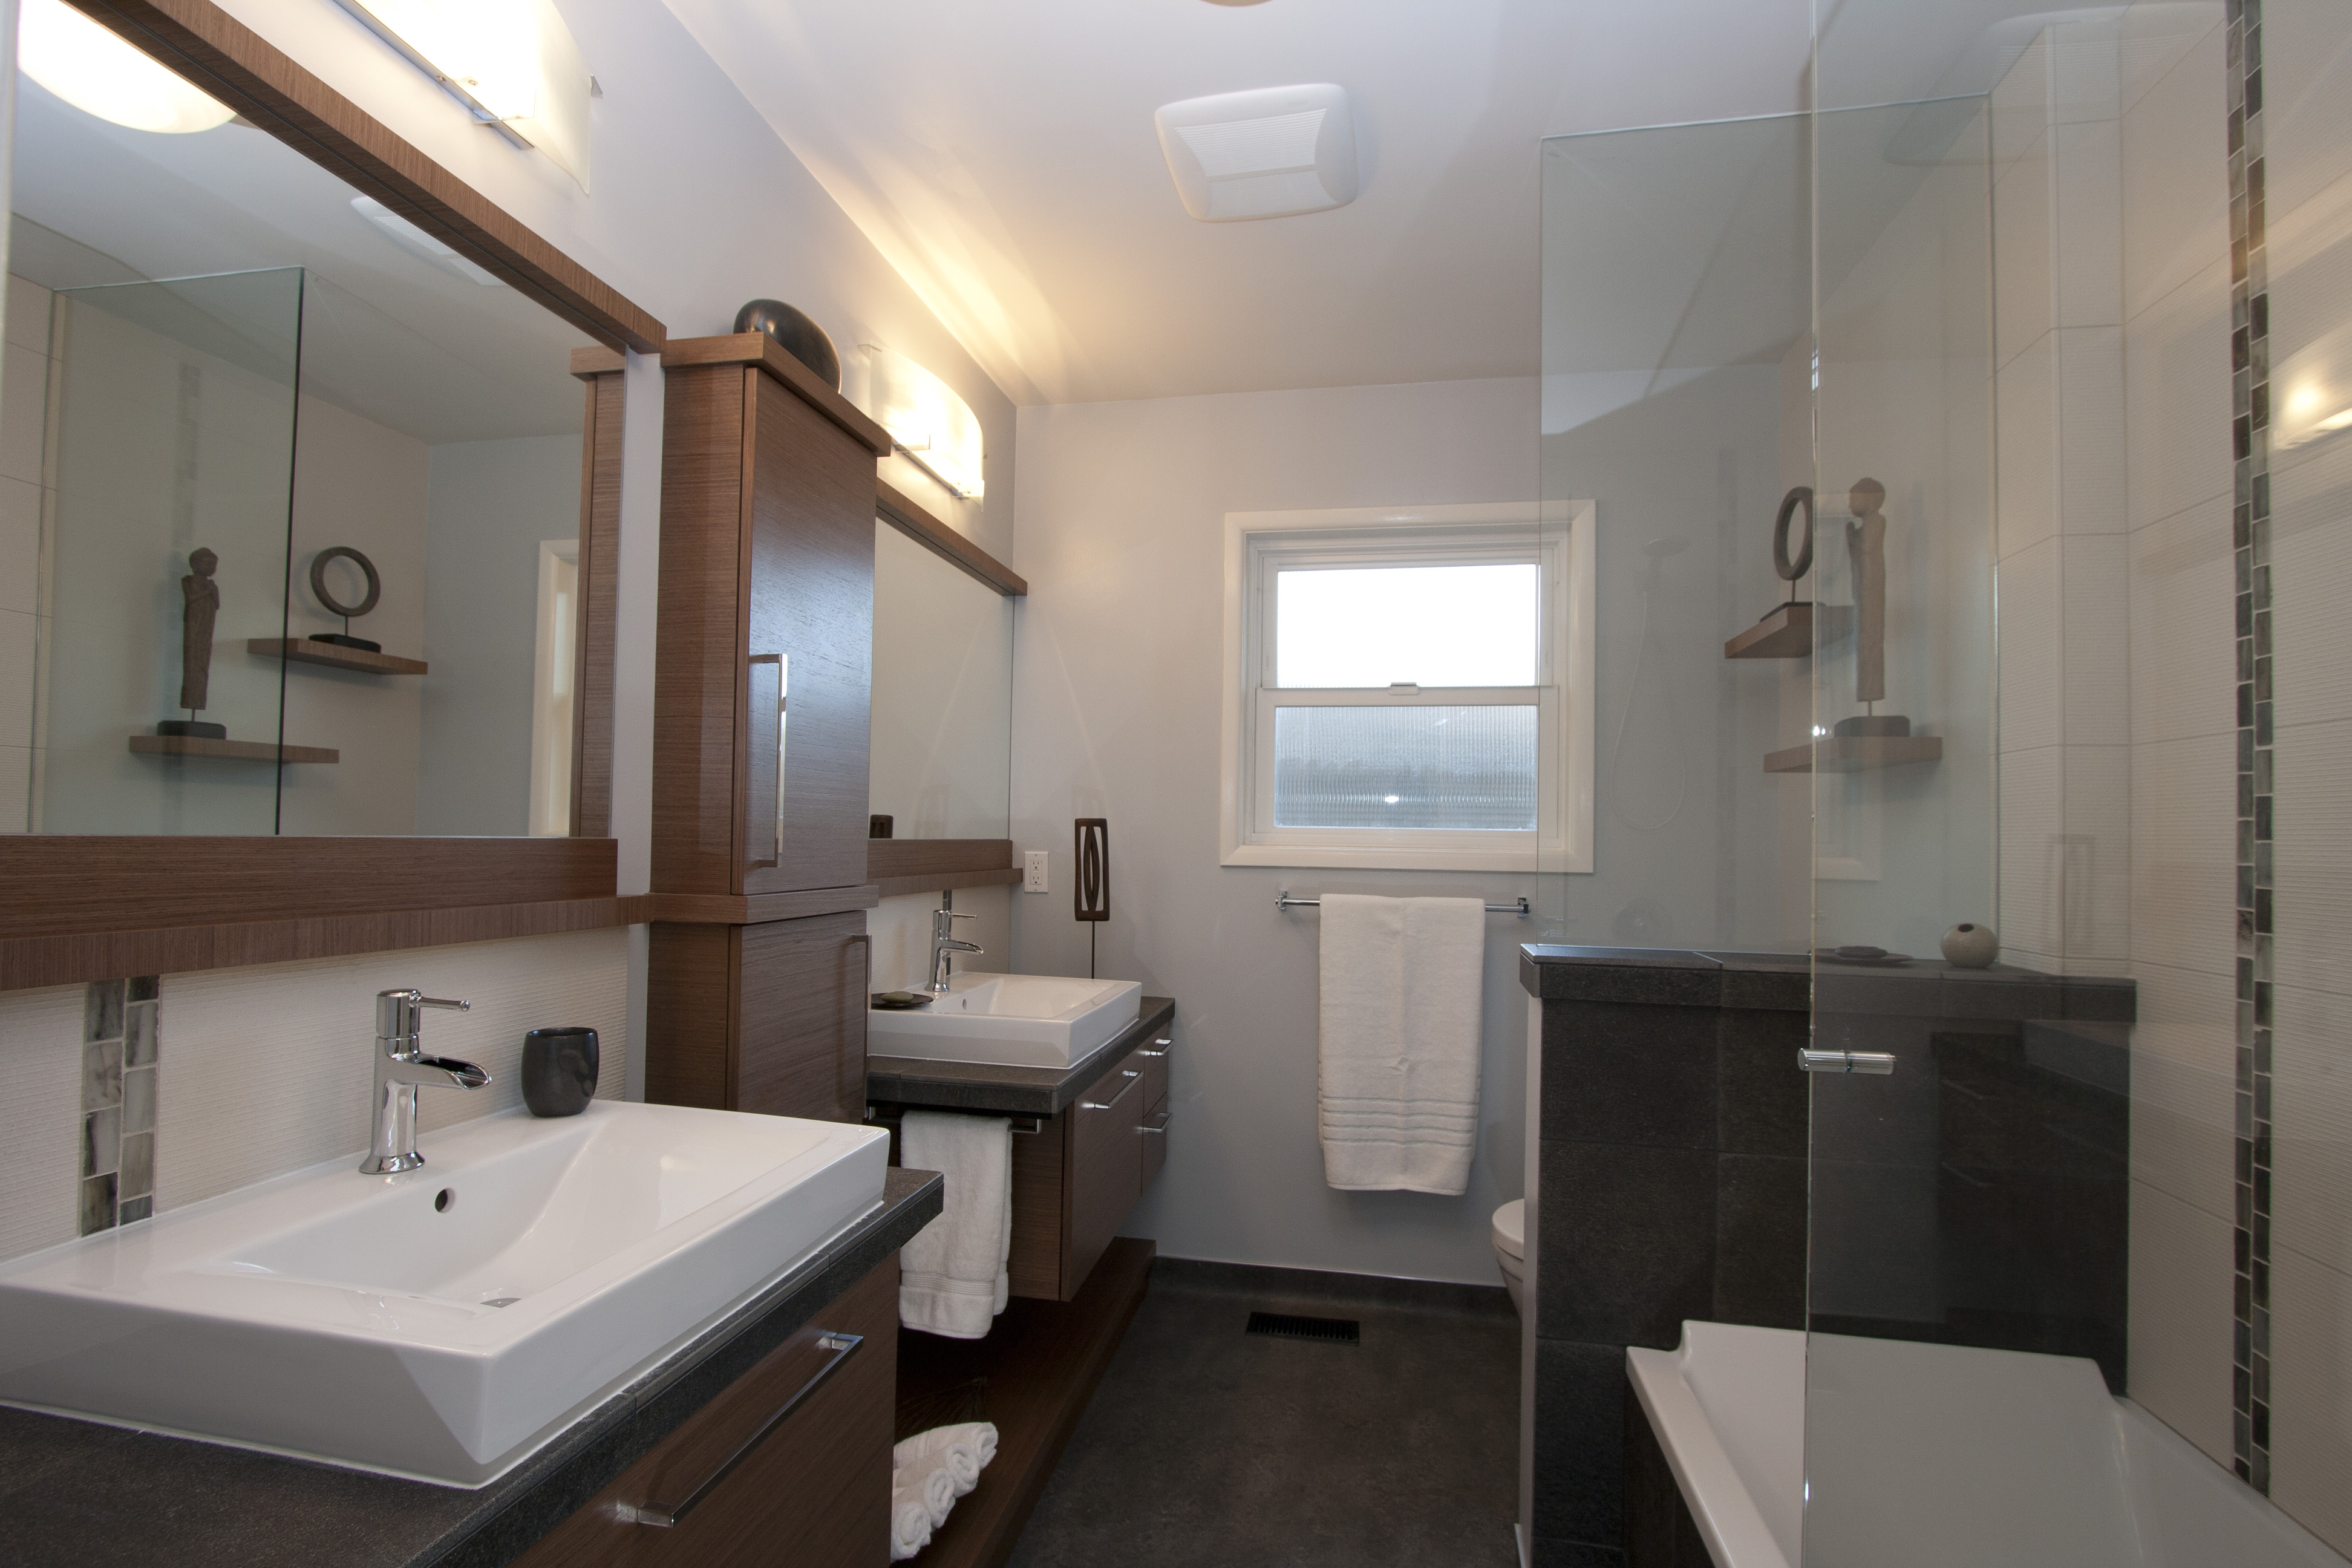 Bathroom Remodel 25